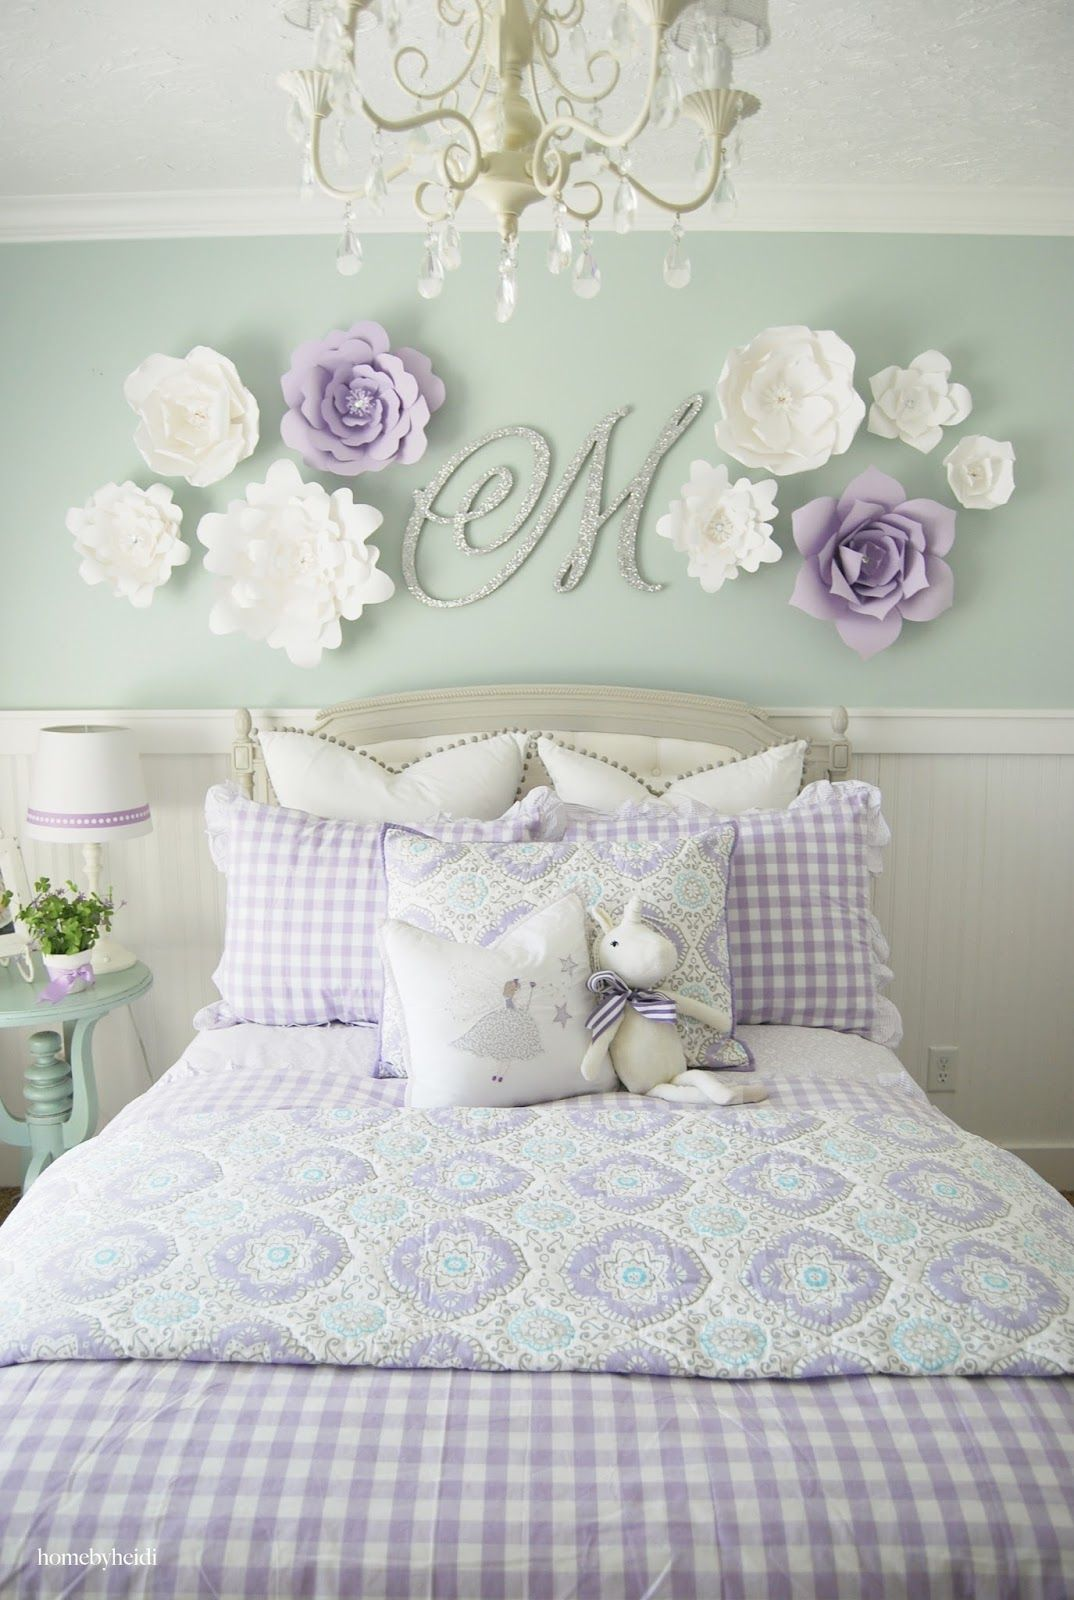 Princess Bedroom Ideas 8 - Decoratoo